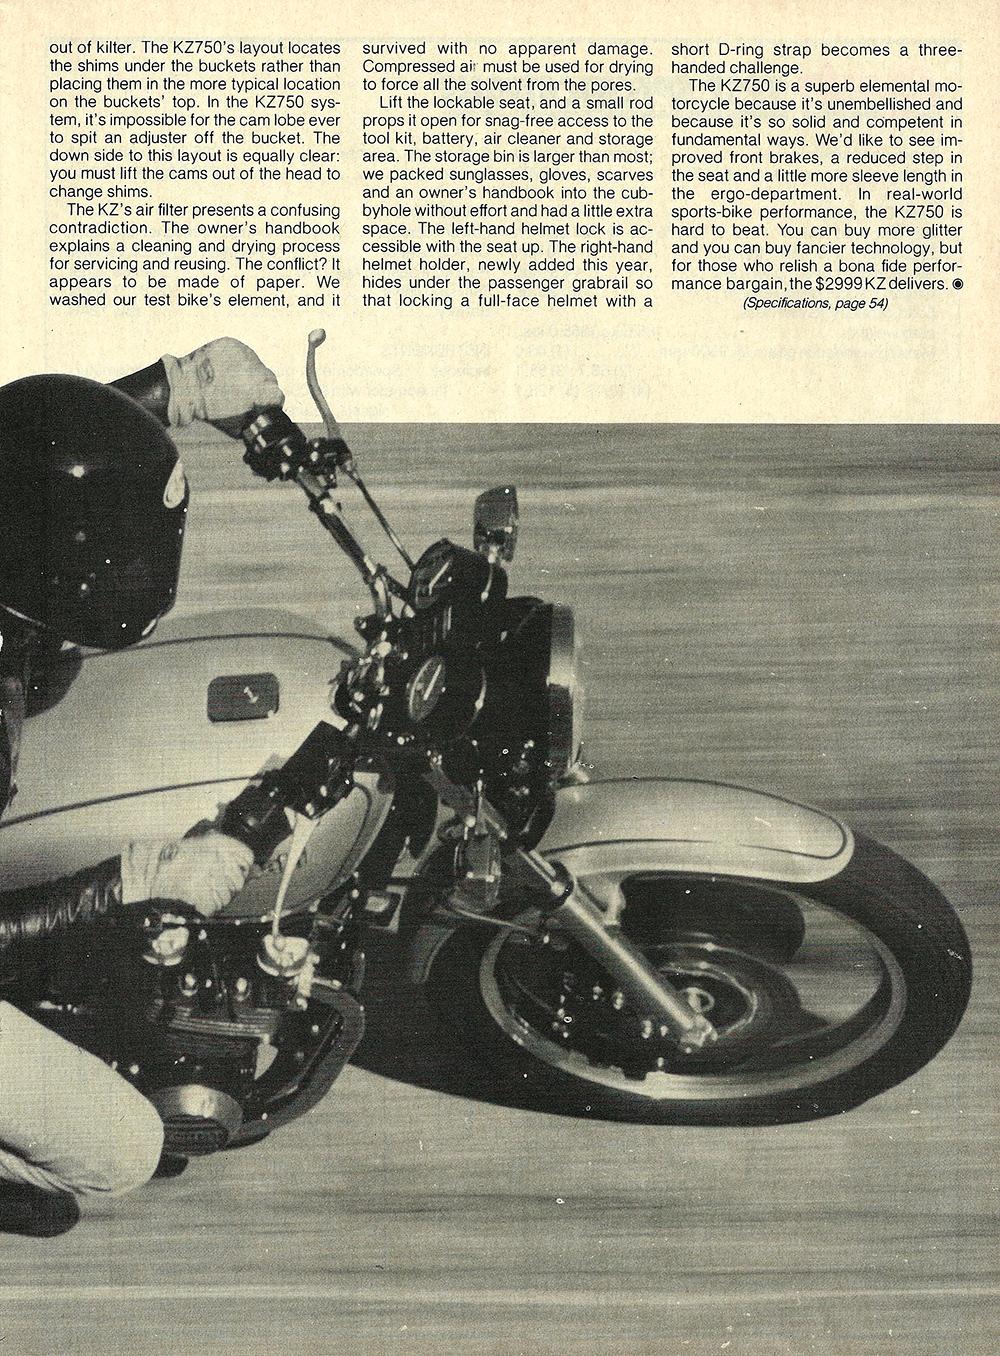 1982 Kawasaki kz750 road test 06.JPG